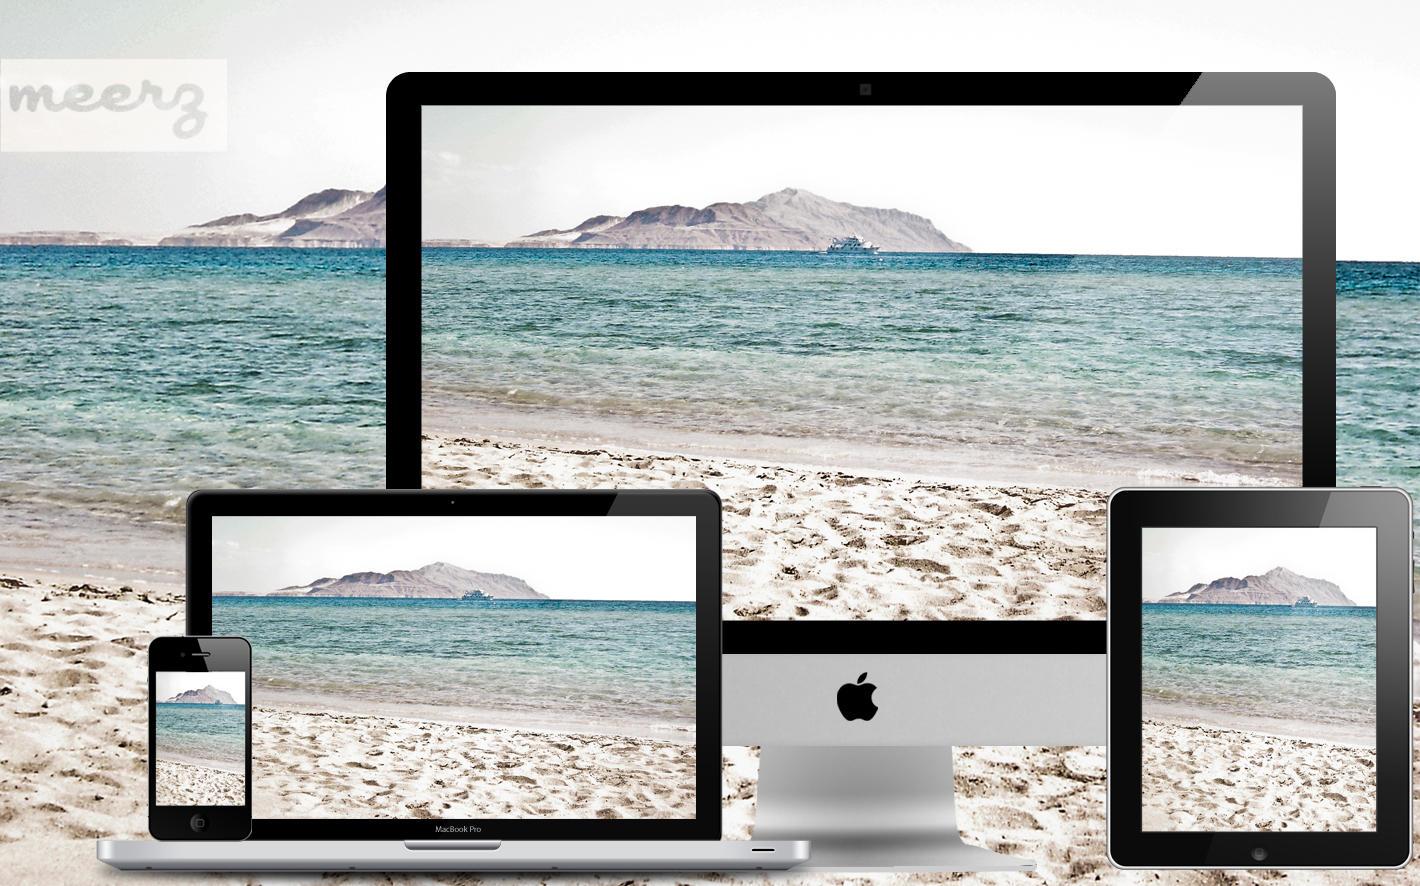 Wallpaper 2 - Beach by xmeerzx